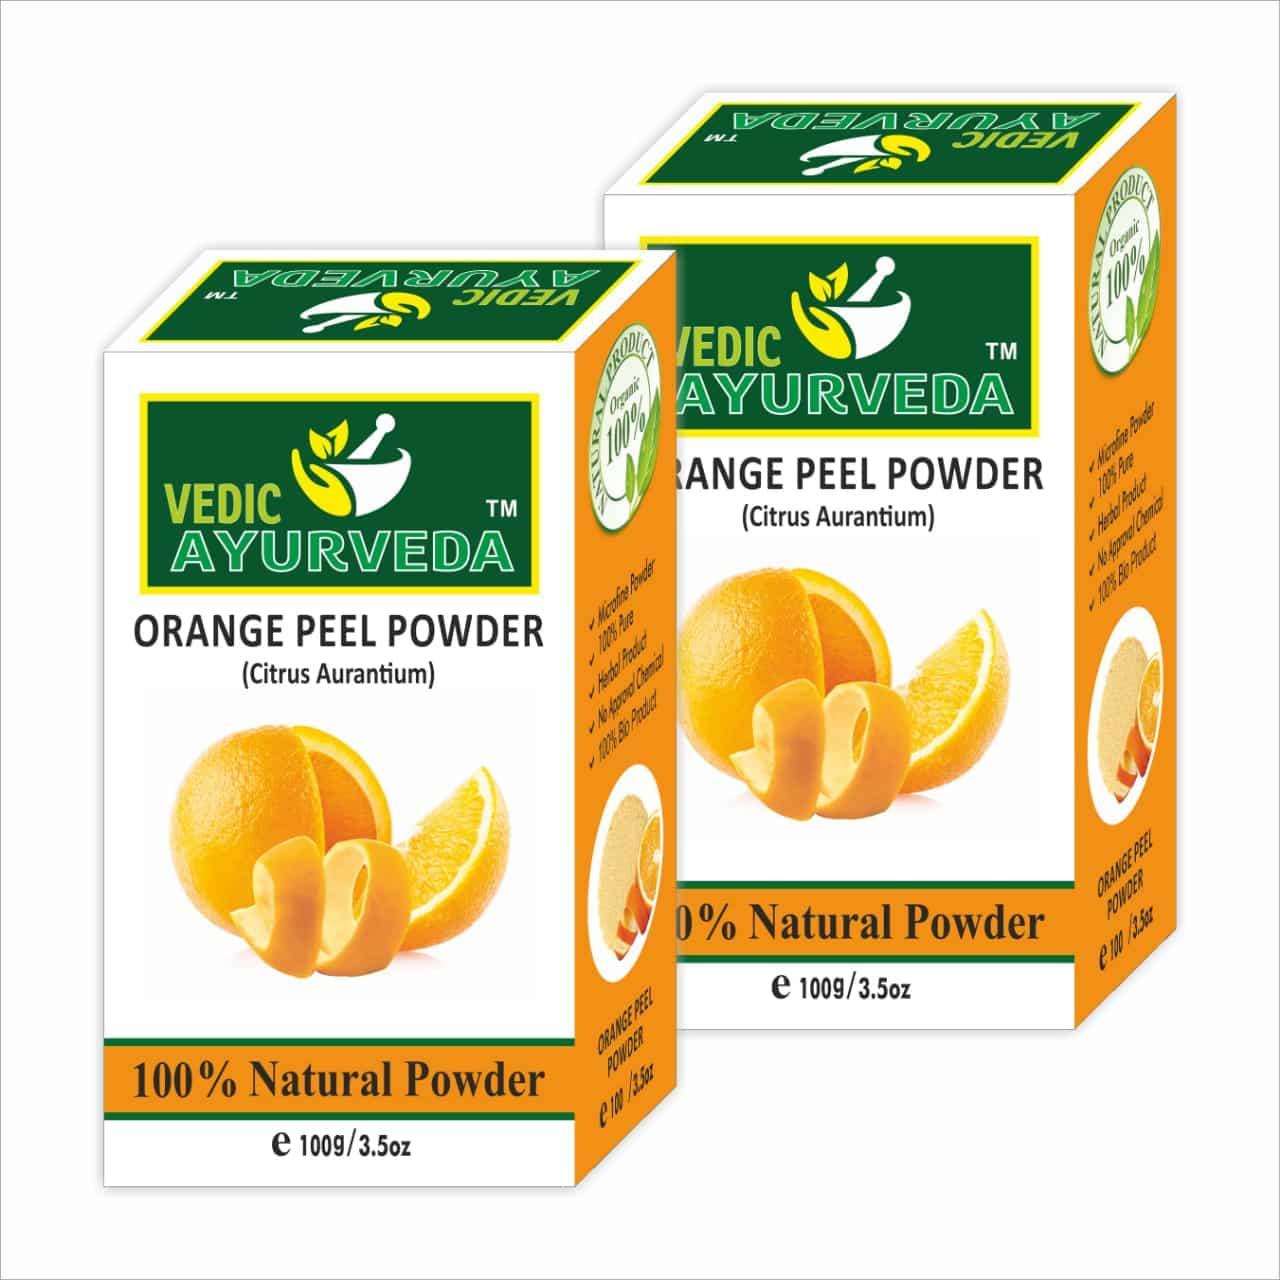 vedicayurvedas orange peel